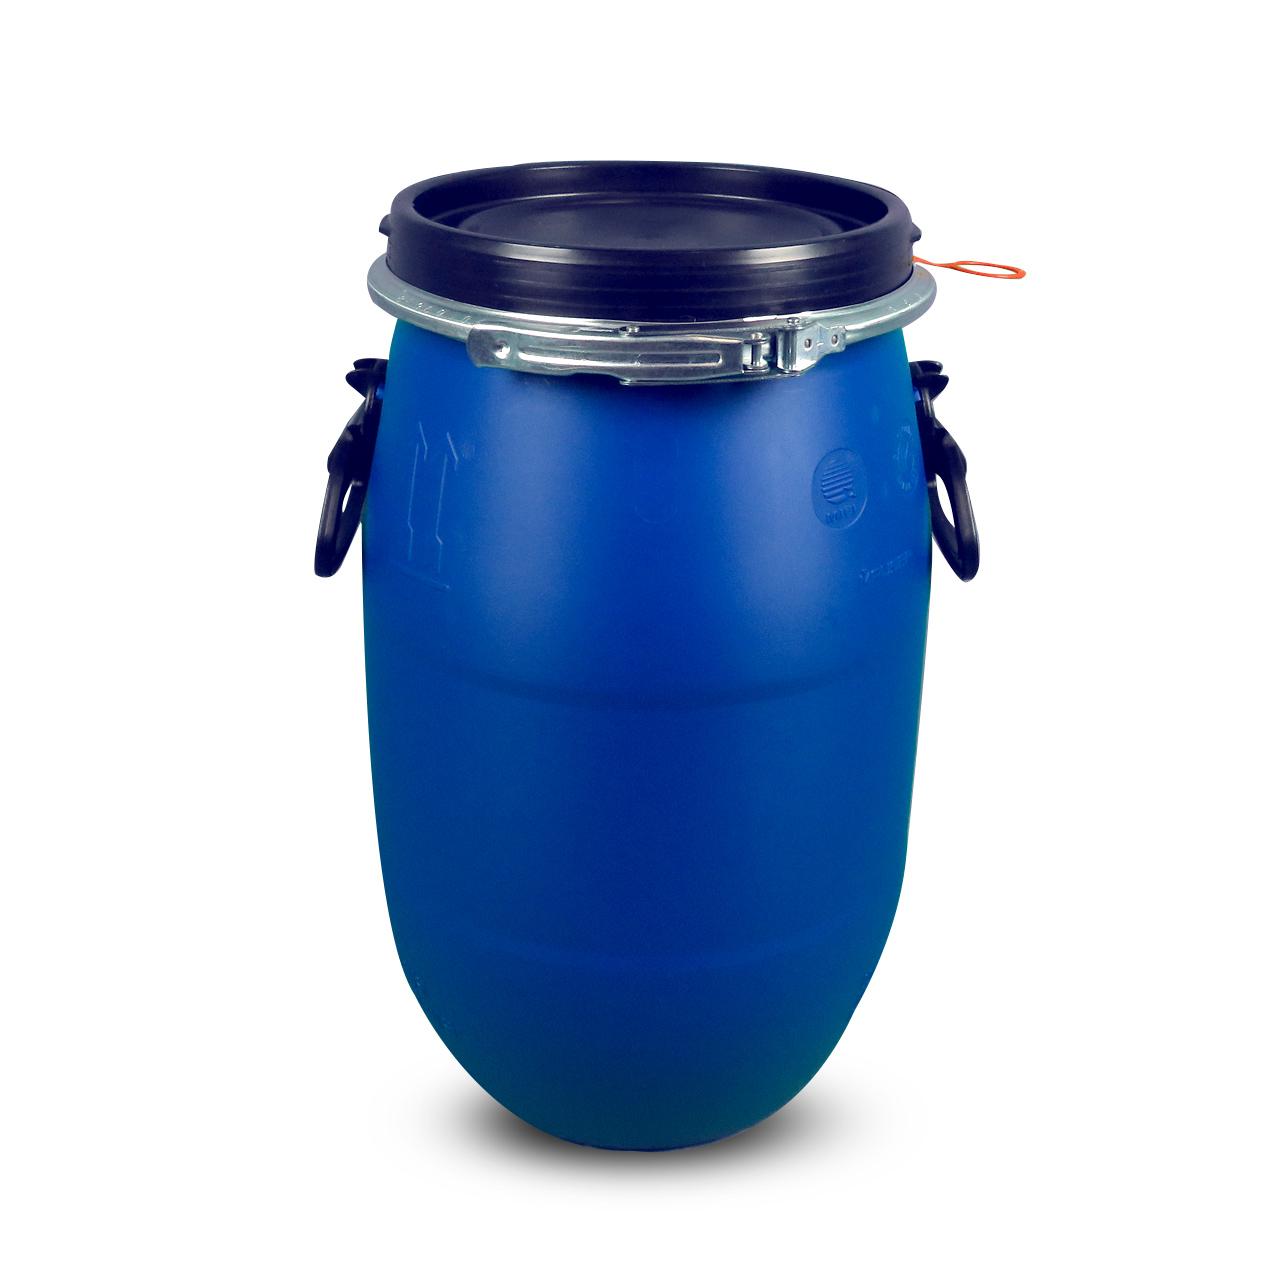 30 L Kunststoffdeckelfass, blau, Entgasung, MAUSER, UN